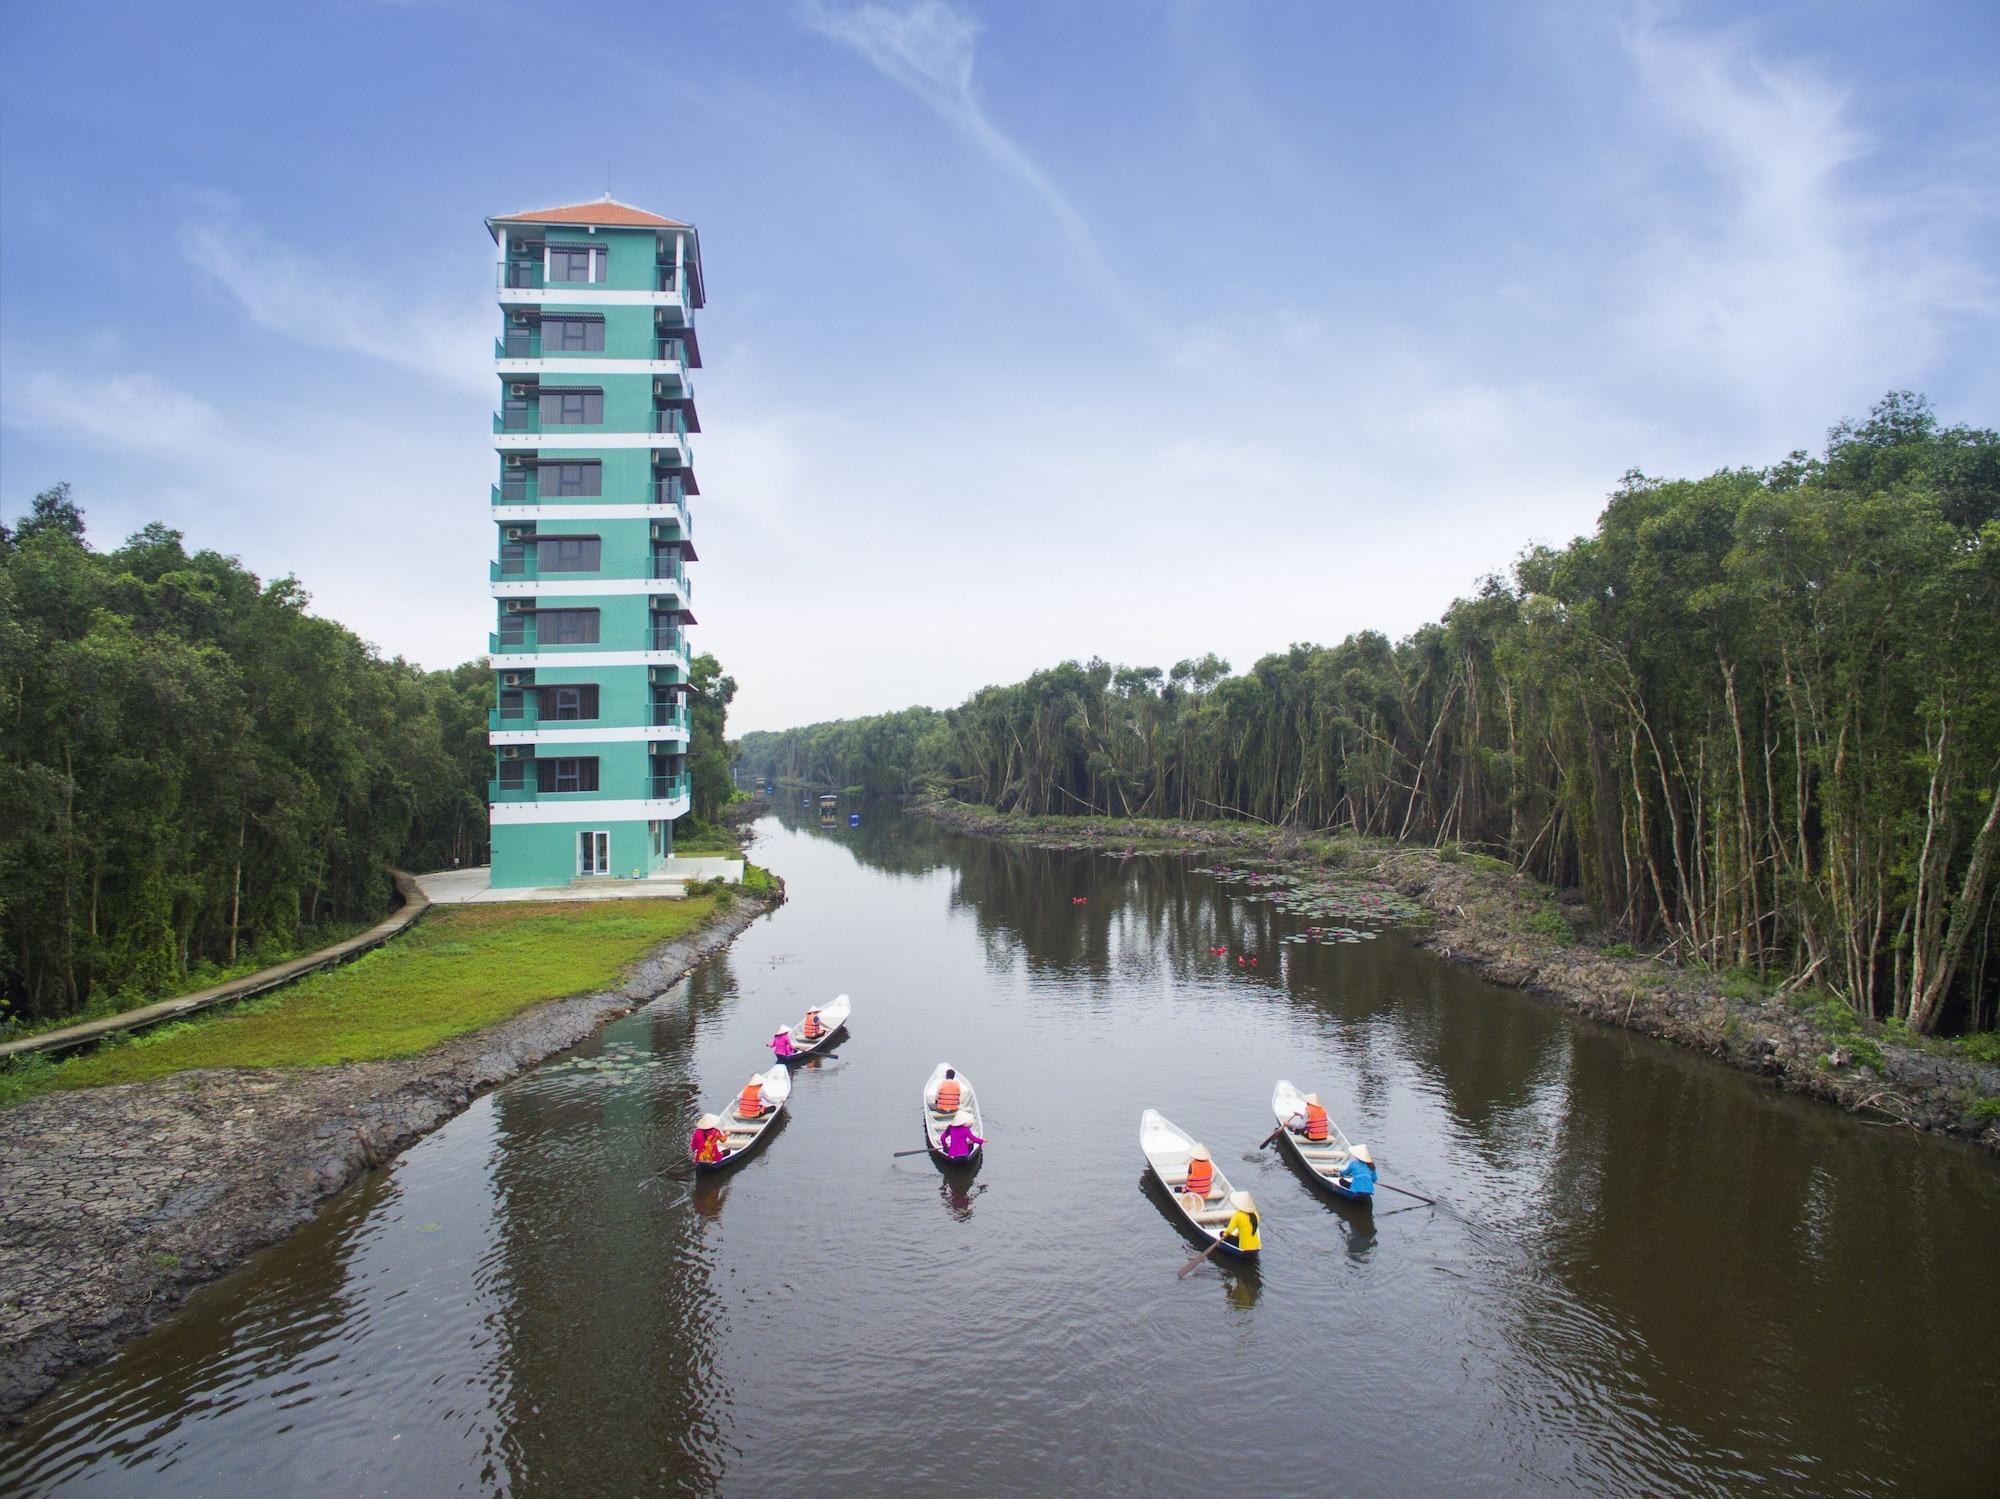 Lang Noi Tan Lap Hotel, Mộc Hóa